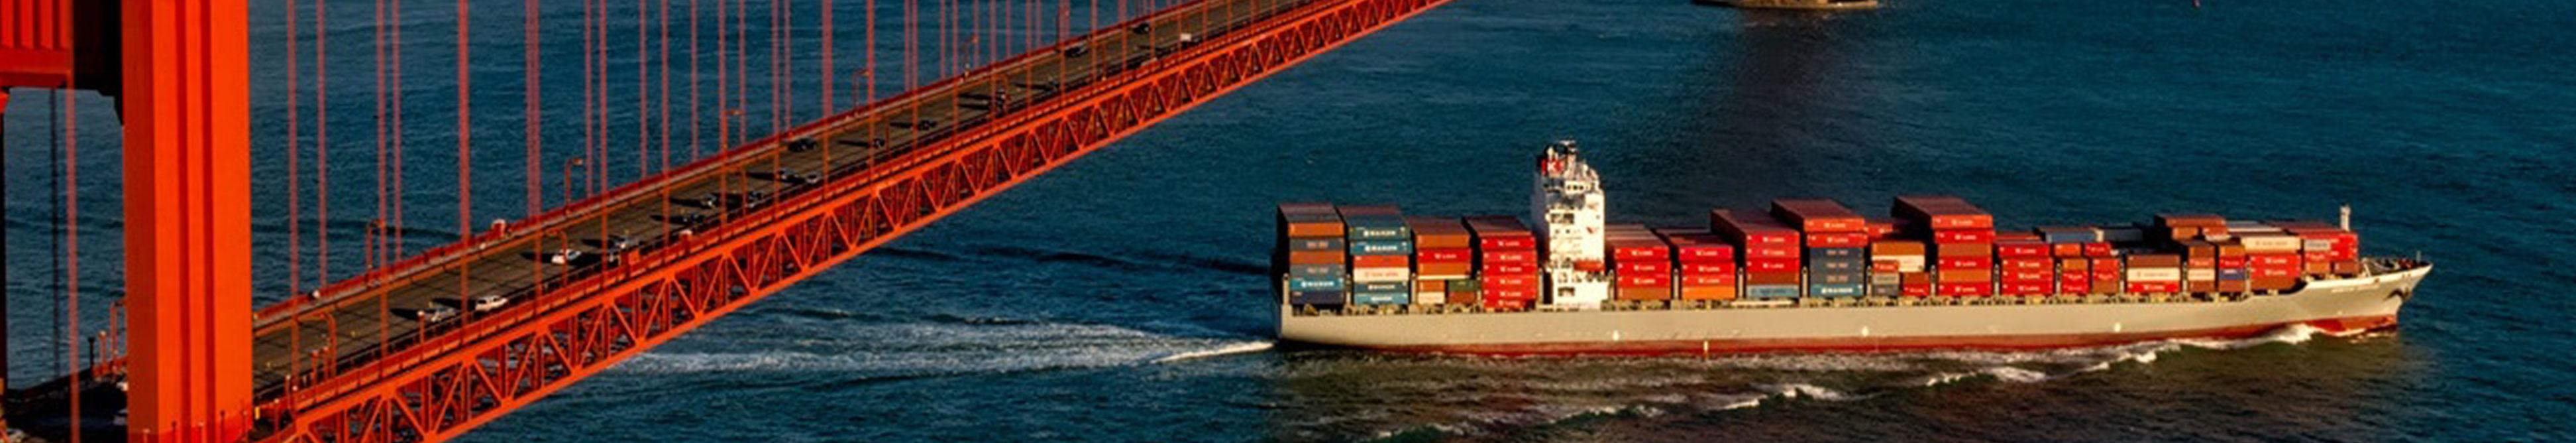 Ocean-Freight-1.jpg